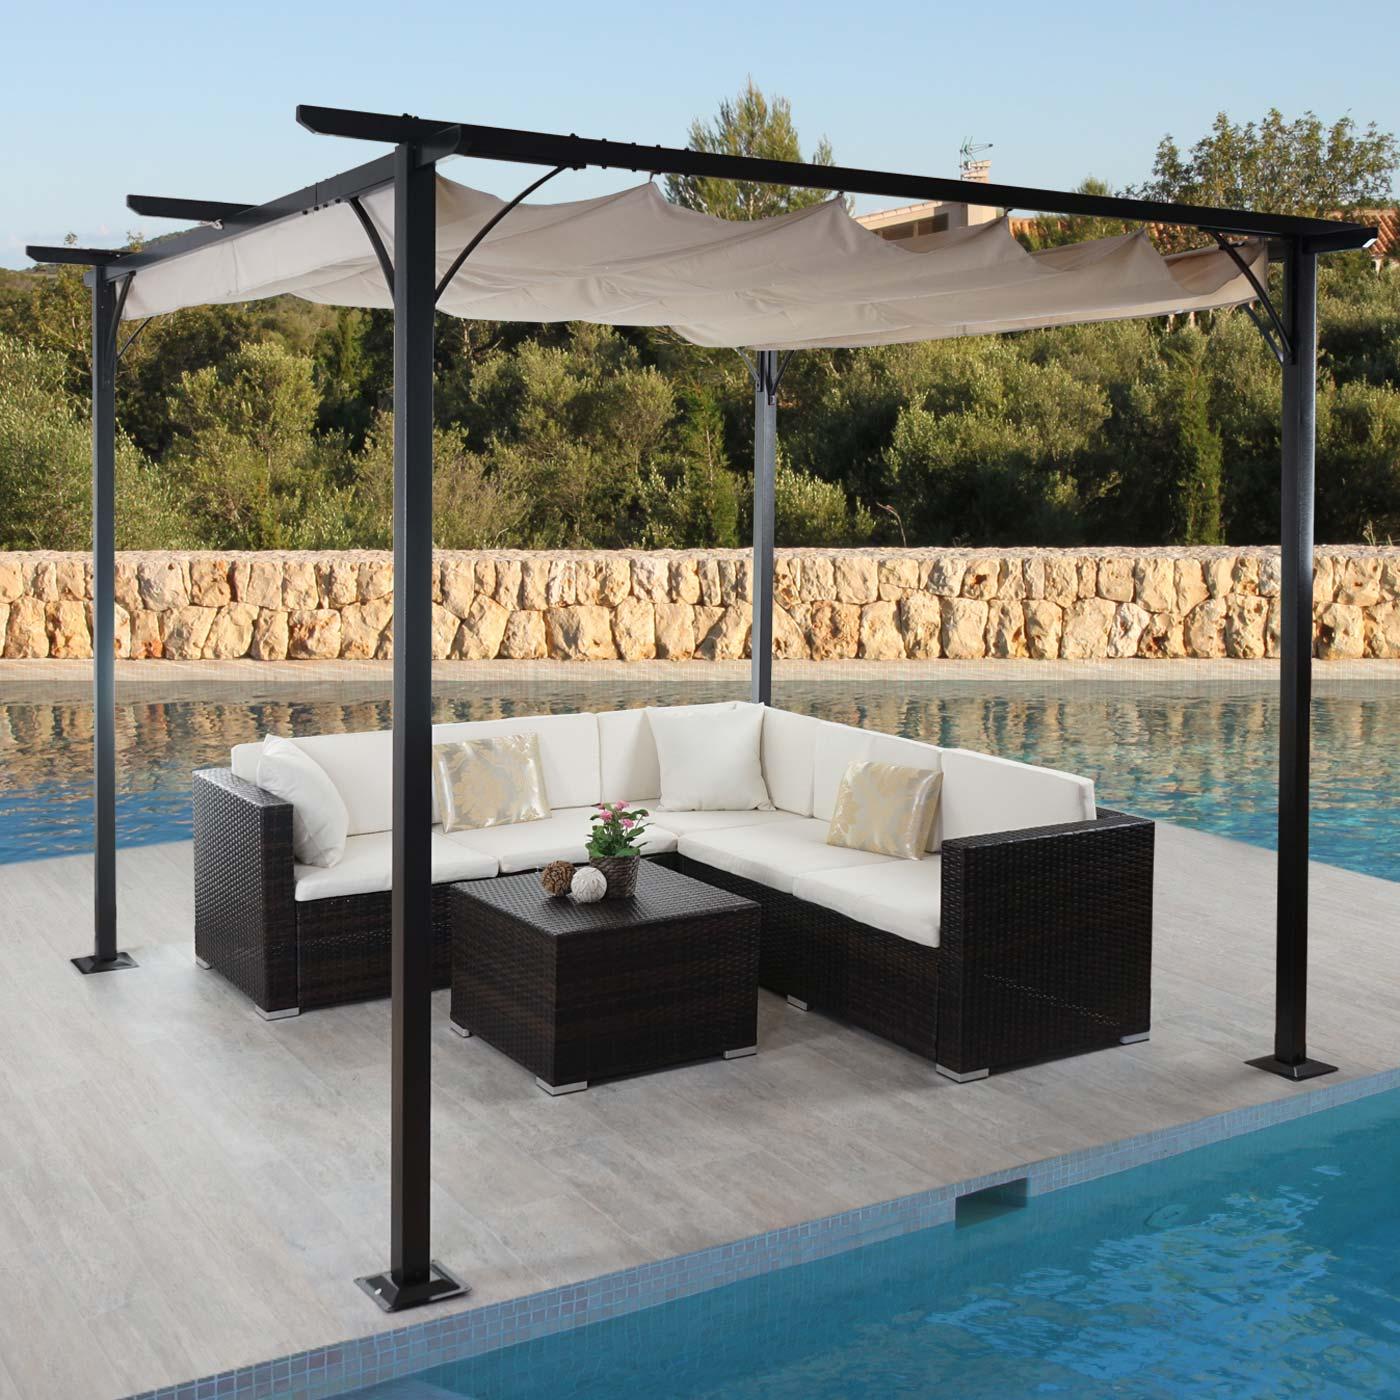 pergola hwc c42 garten pavillon stabiles 6cm gestell. Black Bedroom Furniture Sets. Home Design Ideas